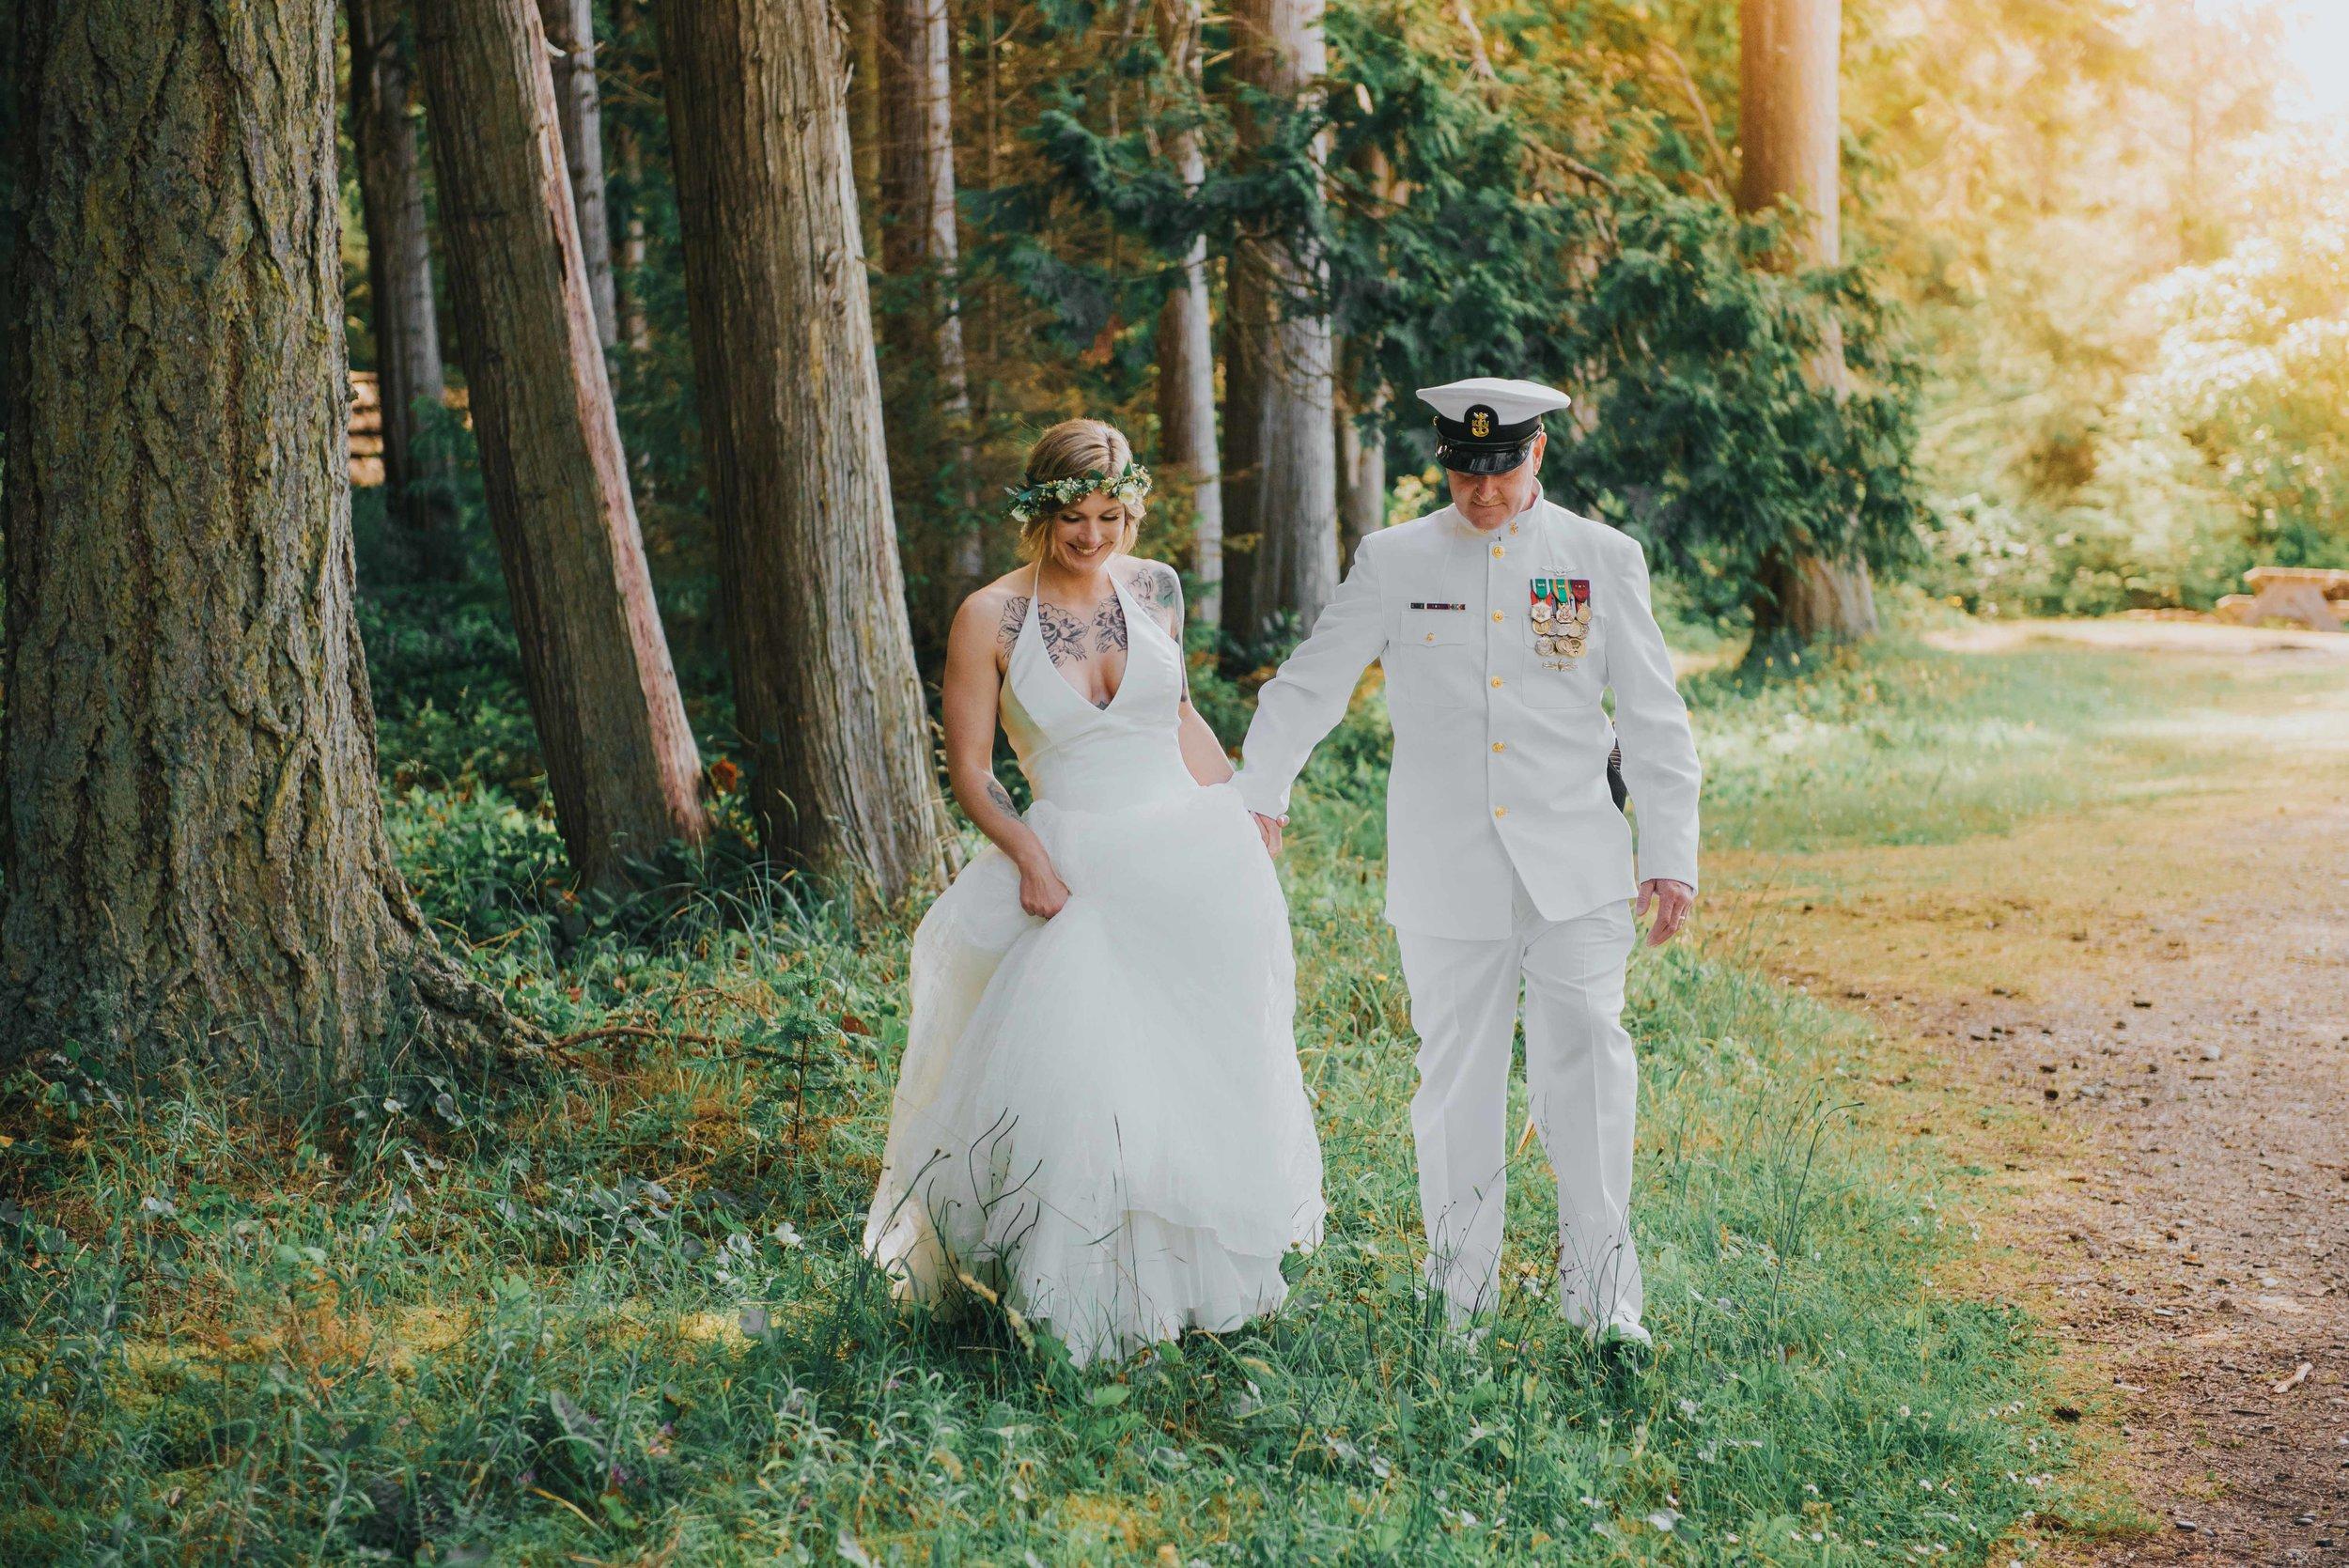 SSPNW-Wedding-Photographer (4 of 4).jpg